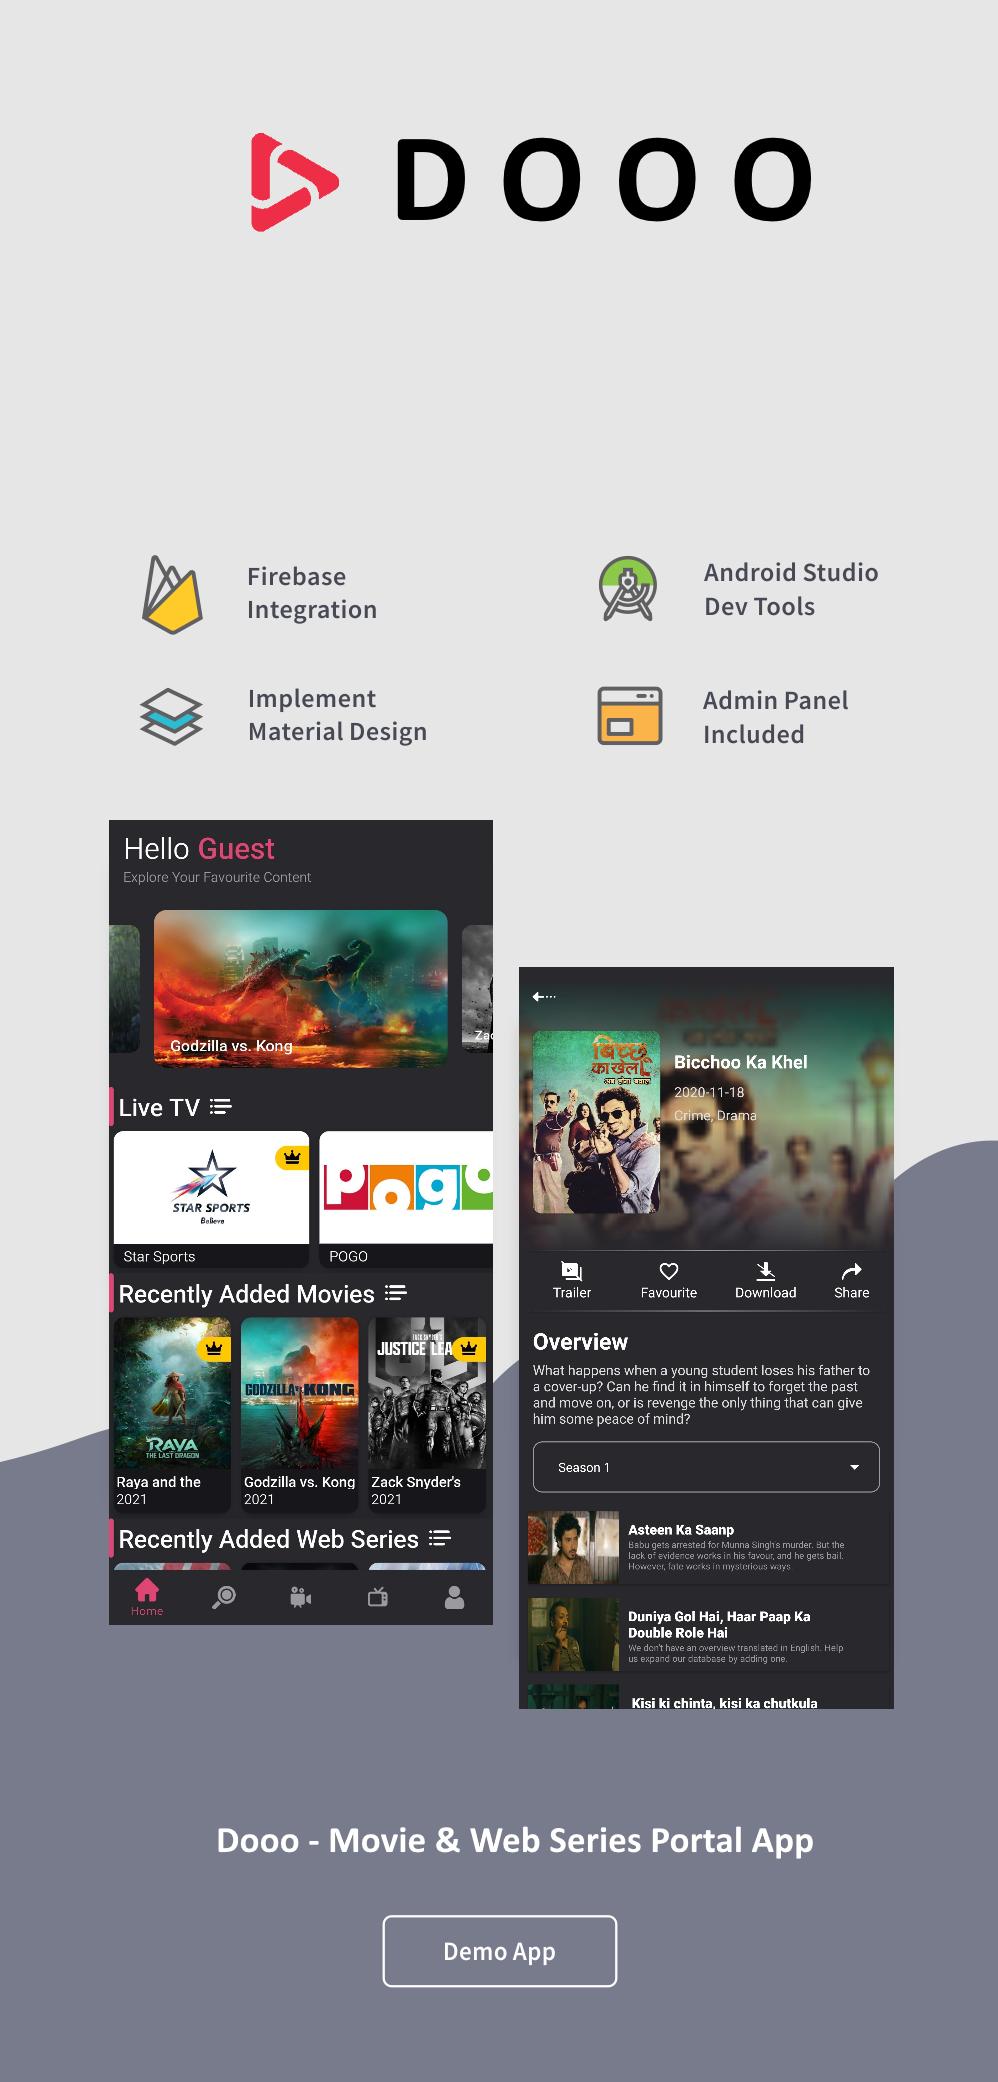 Dooo - Movie & Web Series Portal App User Documentation